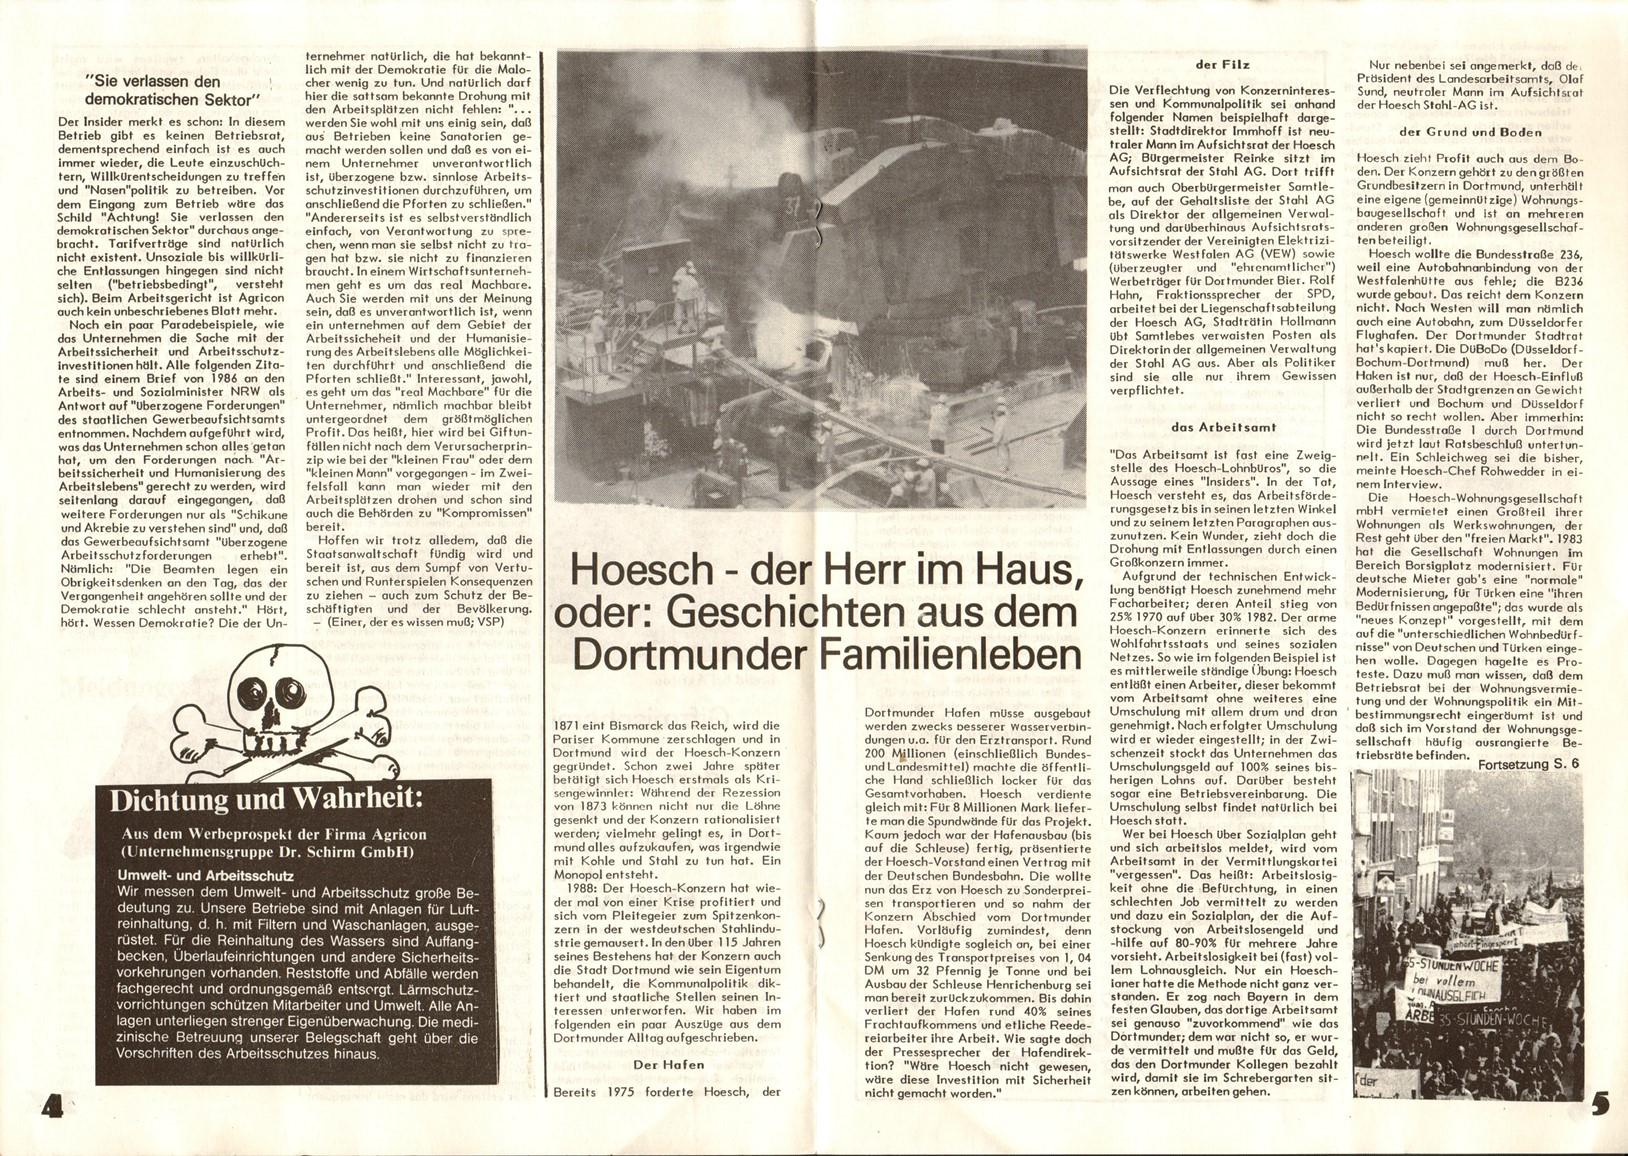 Dortmund_Pottkieker_19880200_03